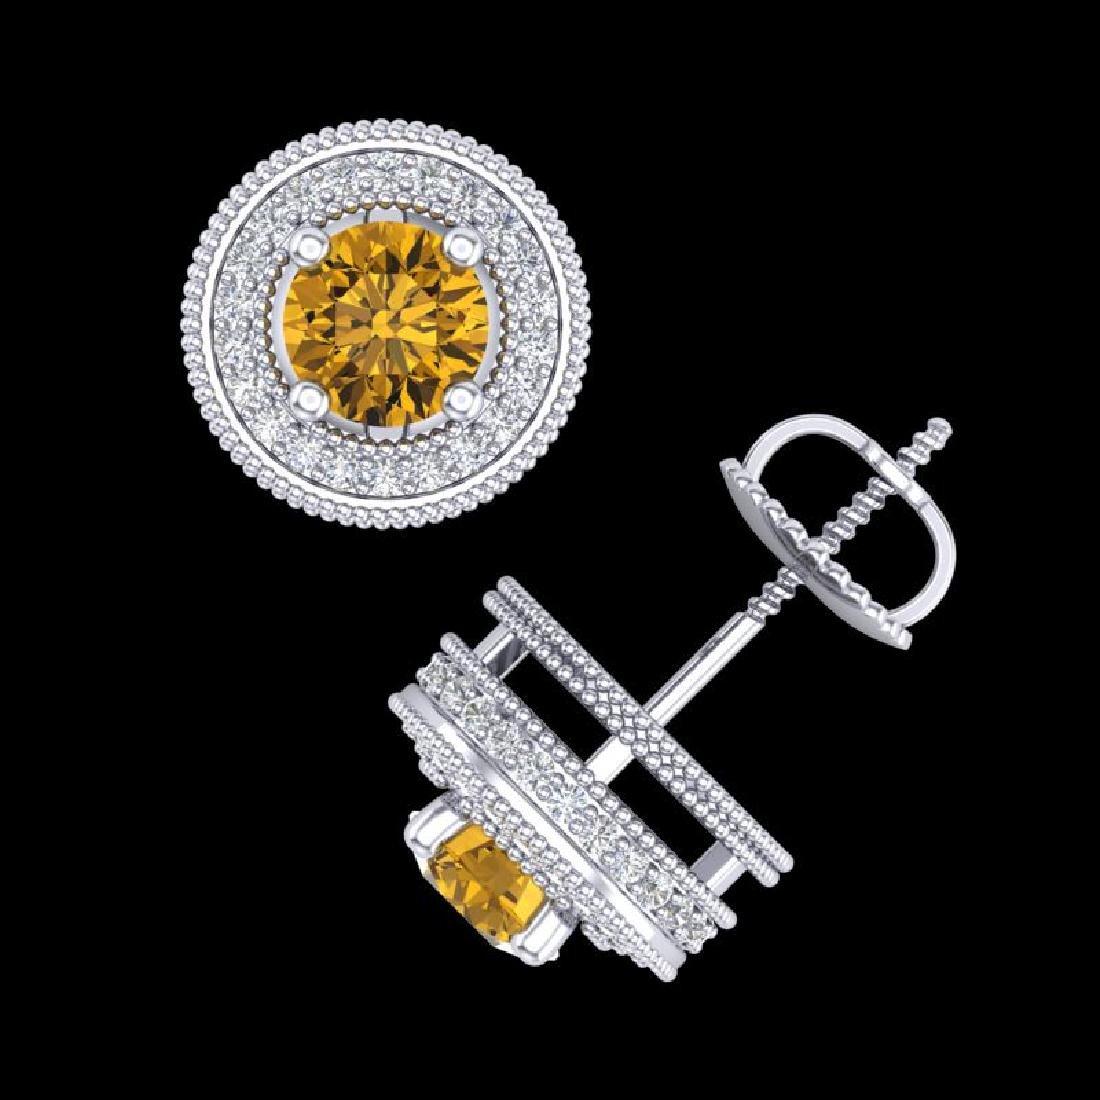 2.09 CTW Intense Fancy Yellow Diamond Art Deco Stud - 3